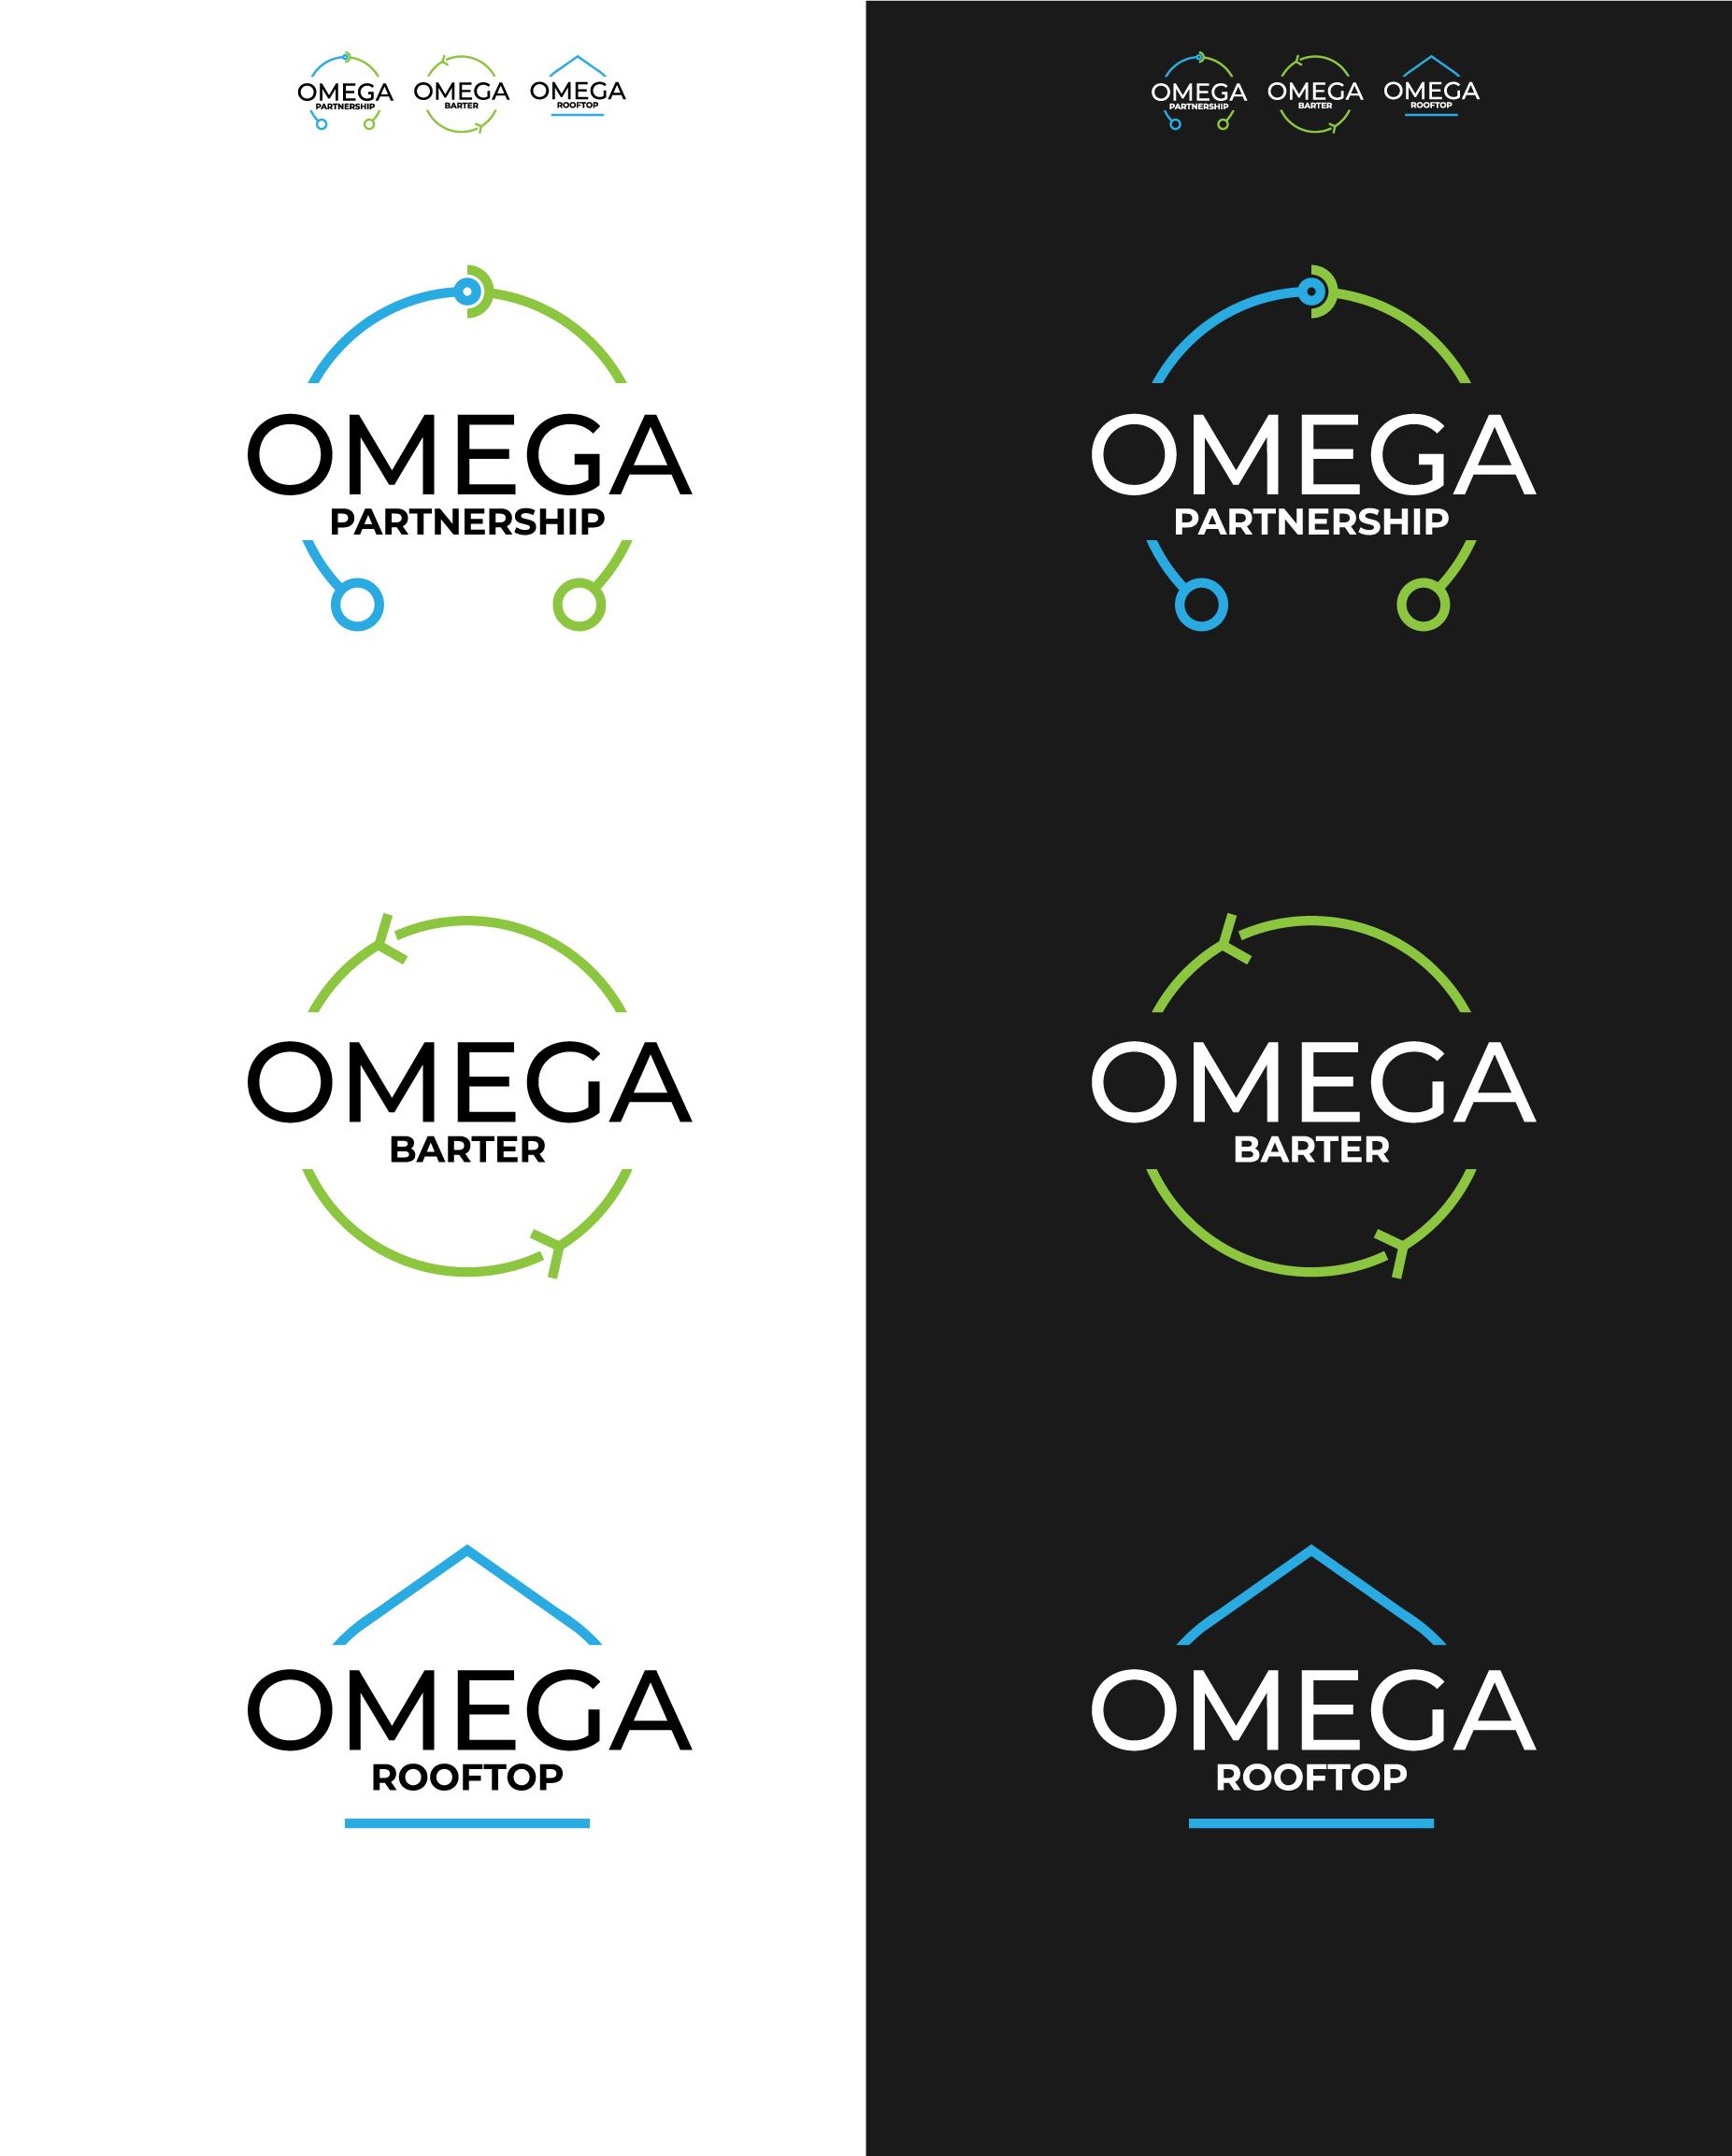 Придумать концепцию логотипа группы компаний фото f_9325b7b705d06ced.jpg